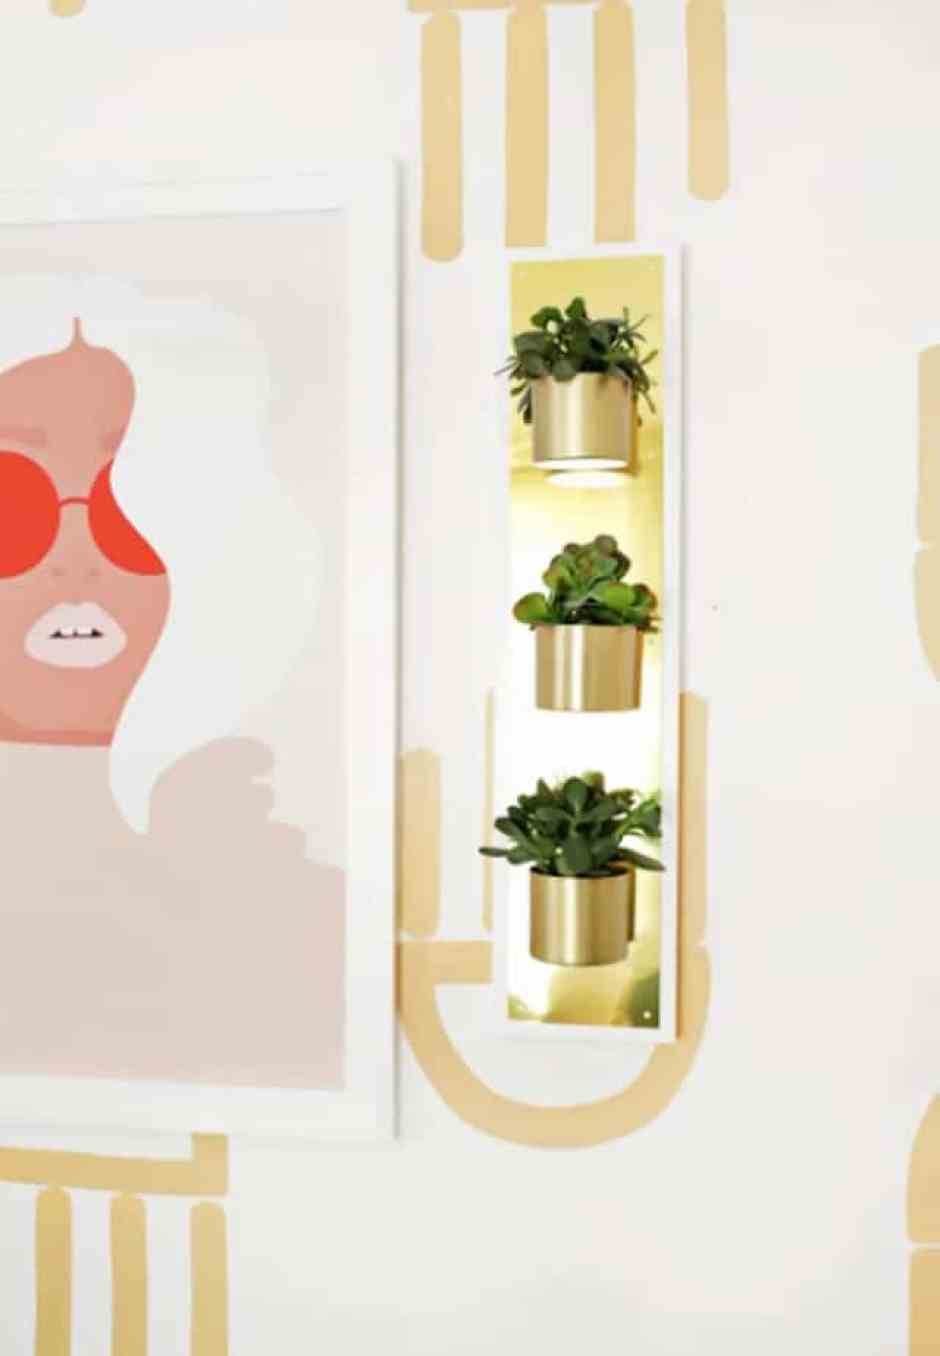 Quadri vegetali per abbellire le pareti